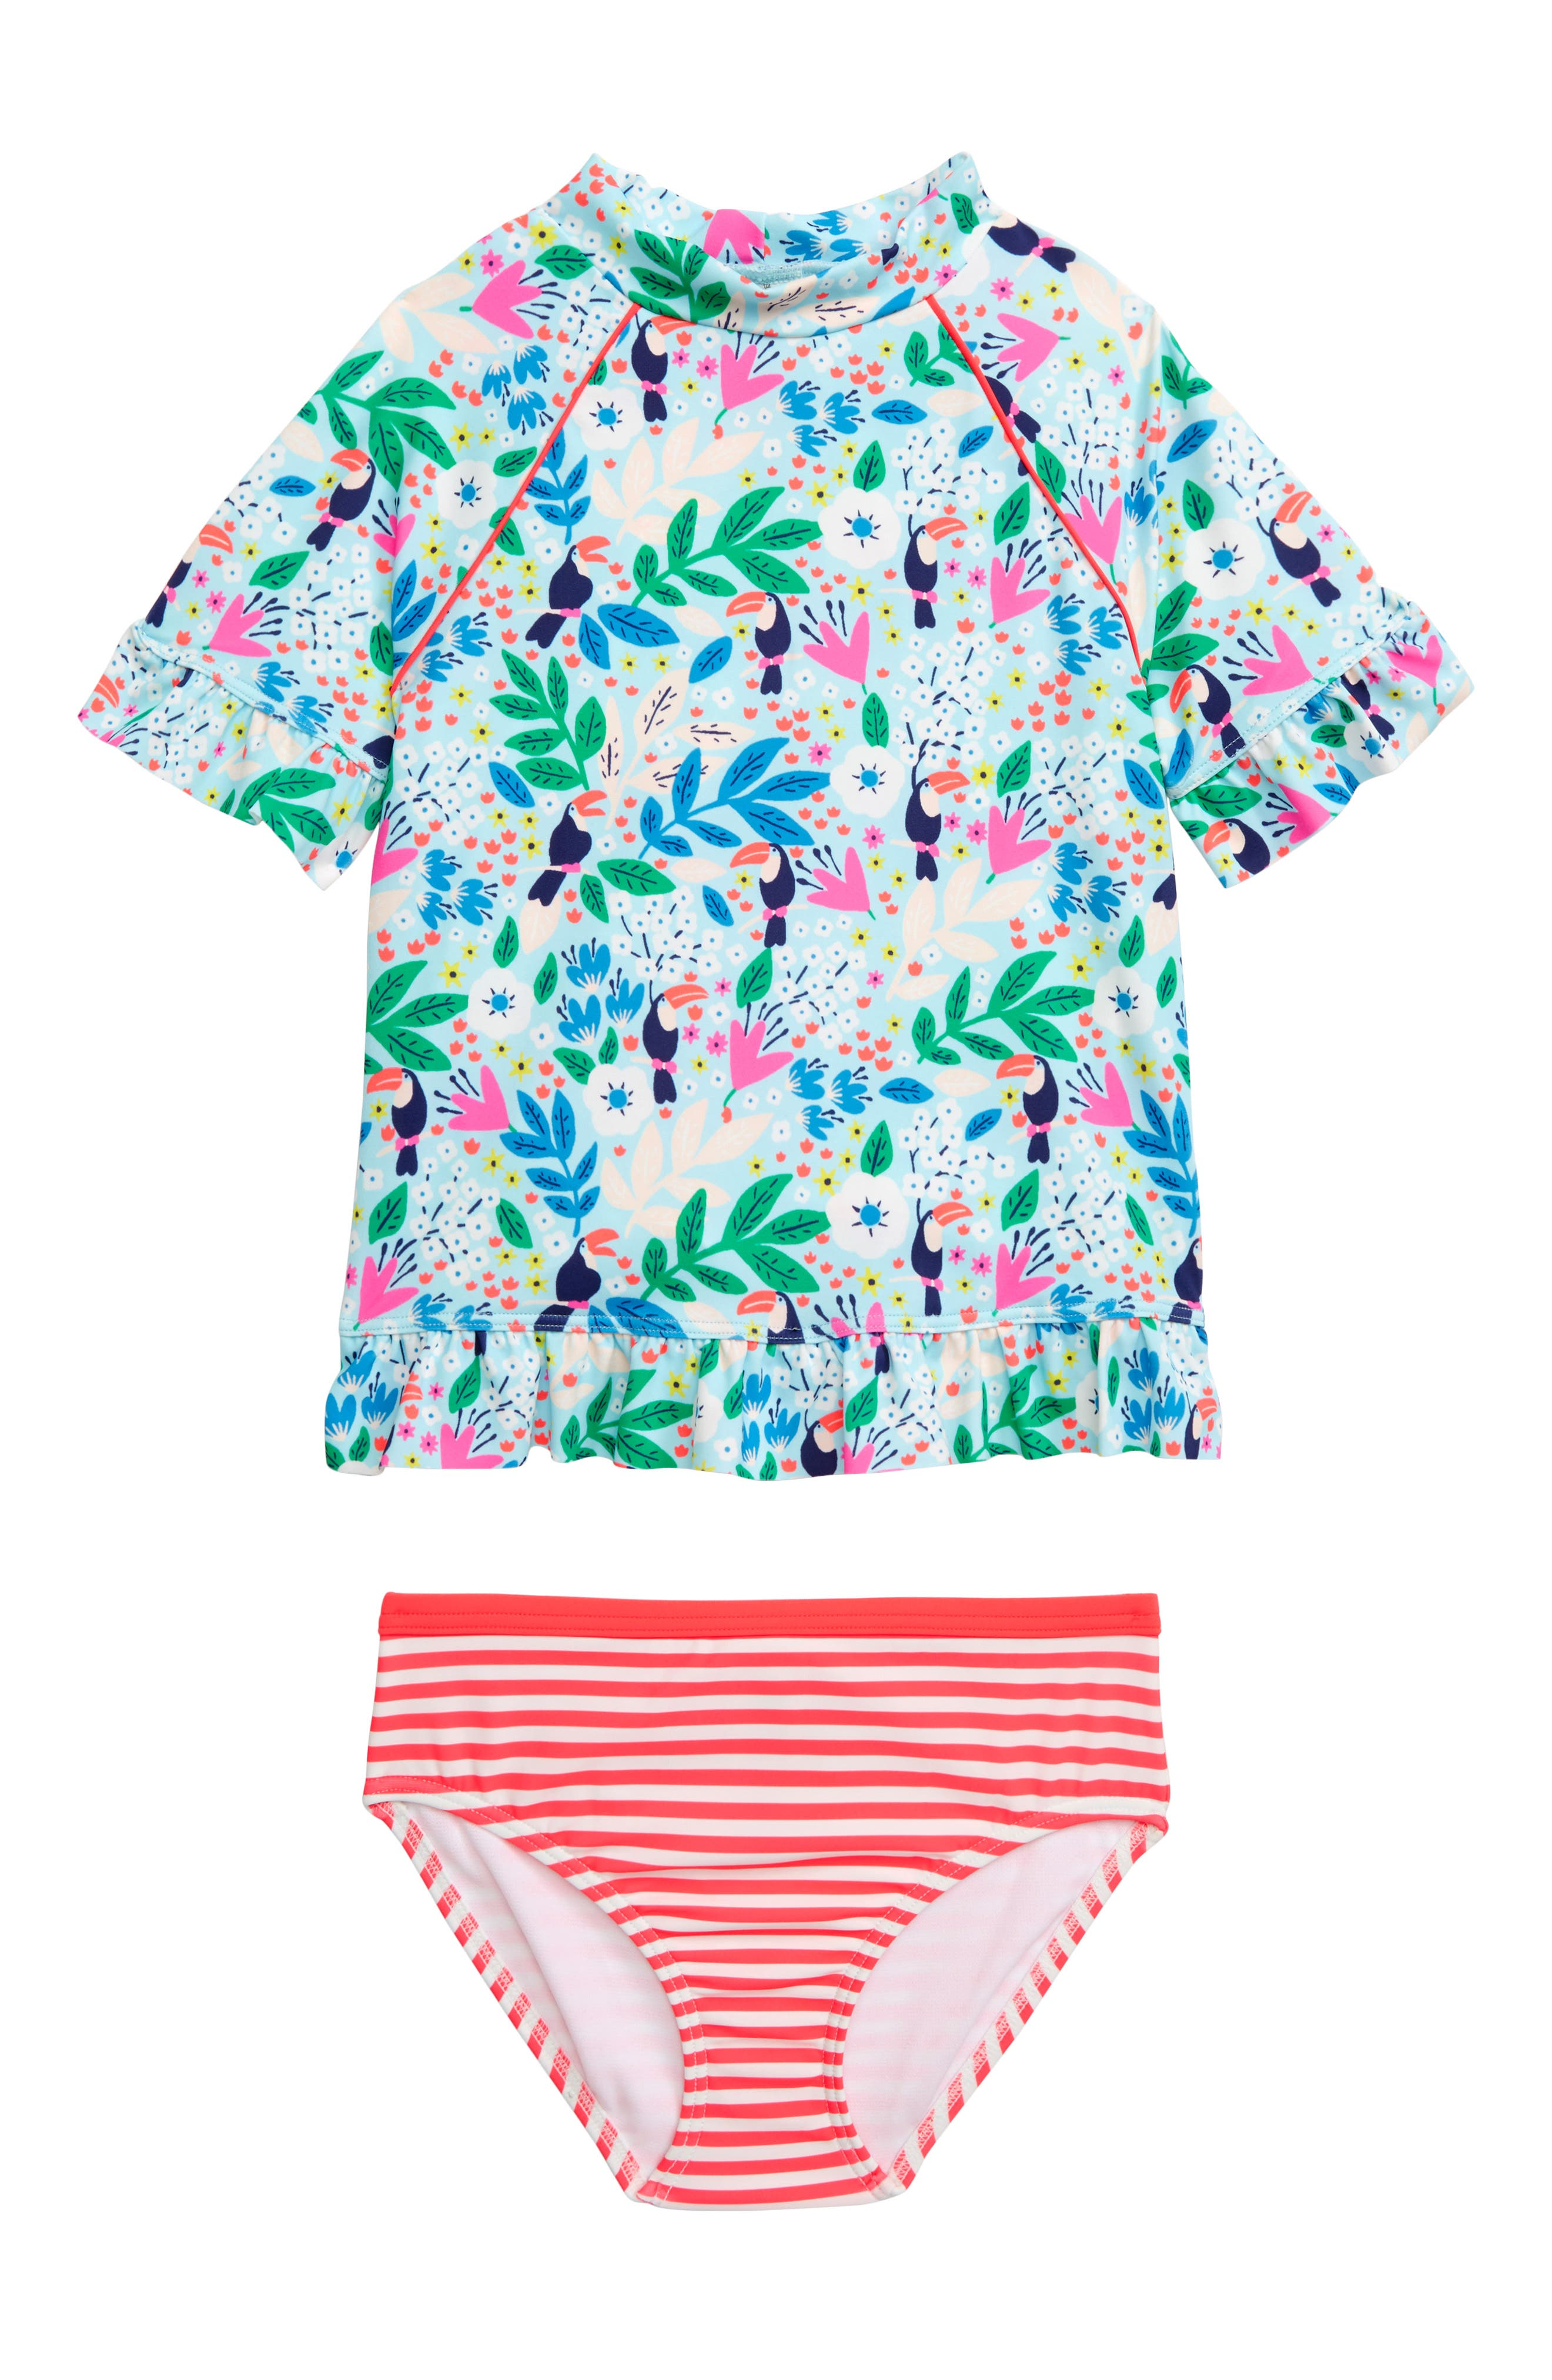 Perfect C Jade White Baby & Toddler Clothing Girls Navy Polka Dot Nautical Swim Suit Swimming Costume 12-18 Months Swimwear